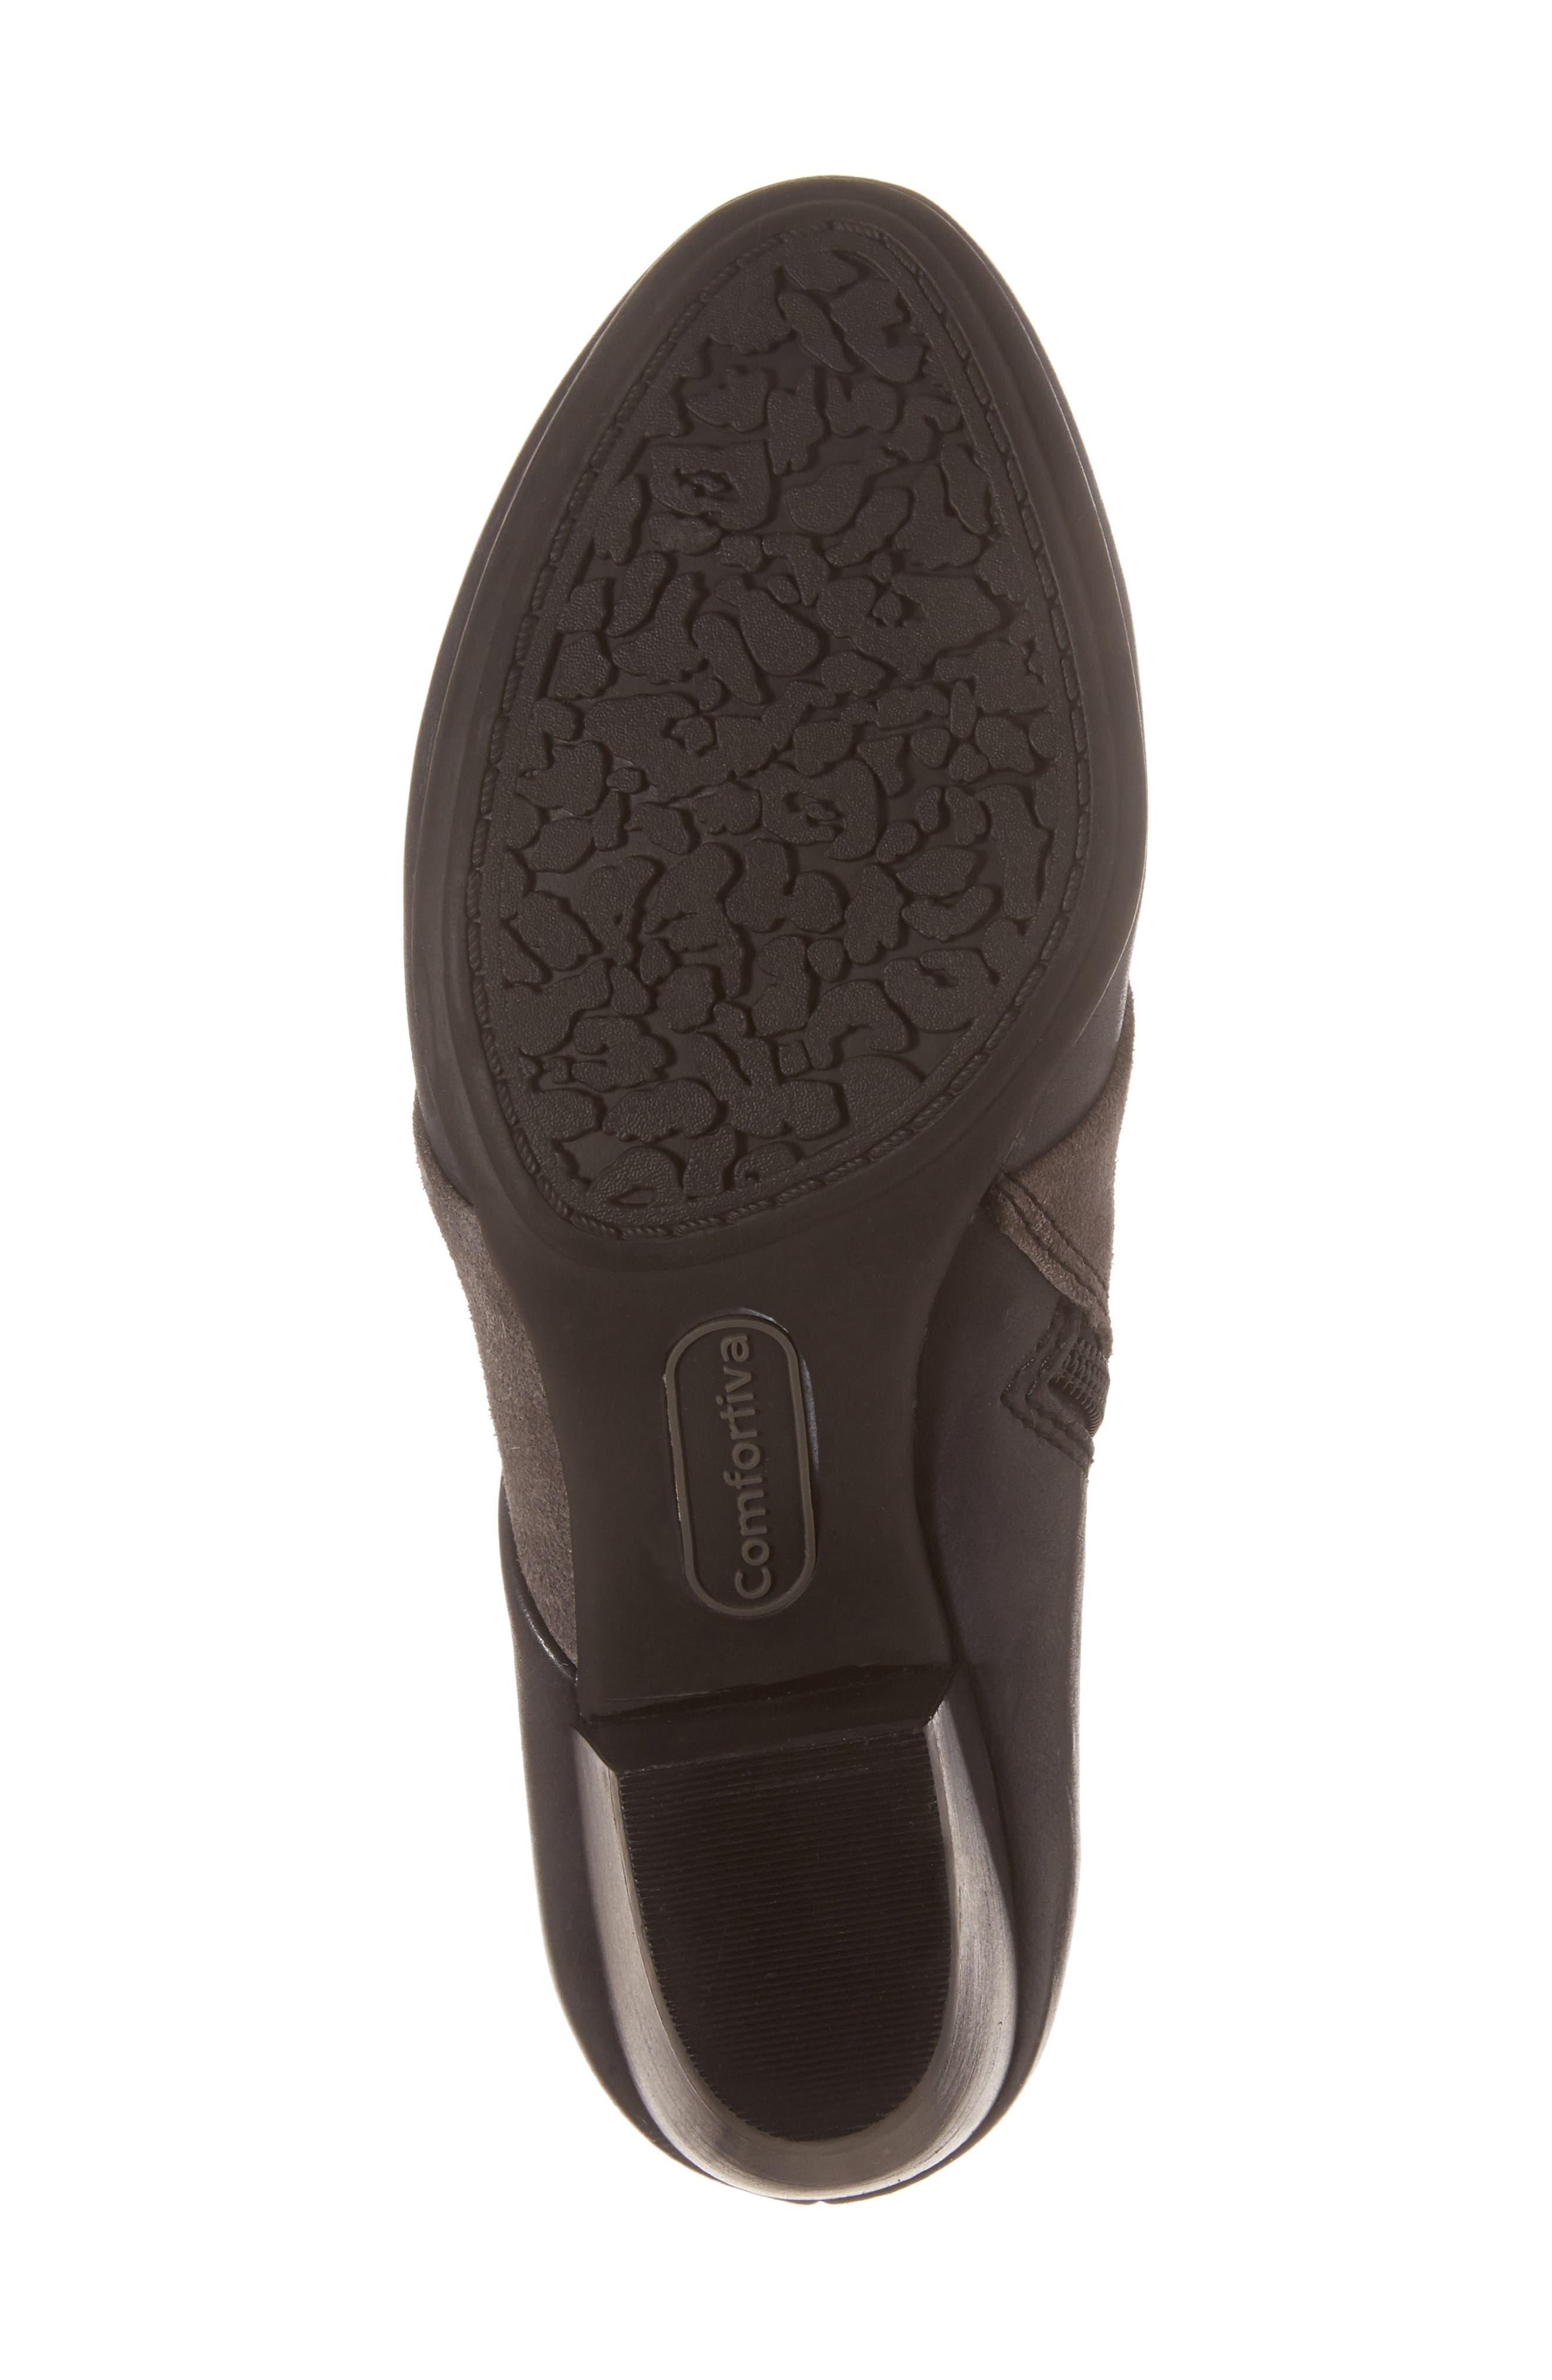 Amesbury Colorblock Bootie,                             Alternate thumbnail 6, color,                             Black/ Steel Grey Leather